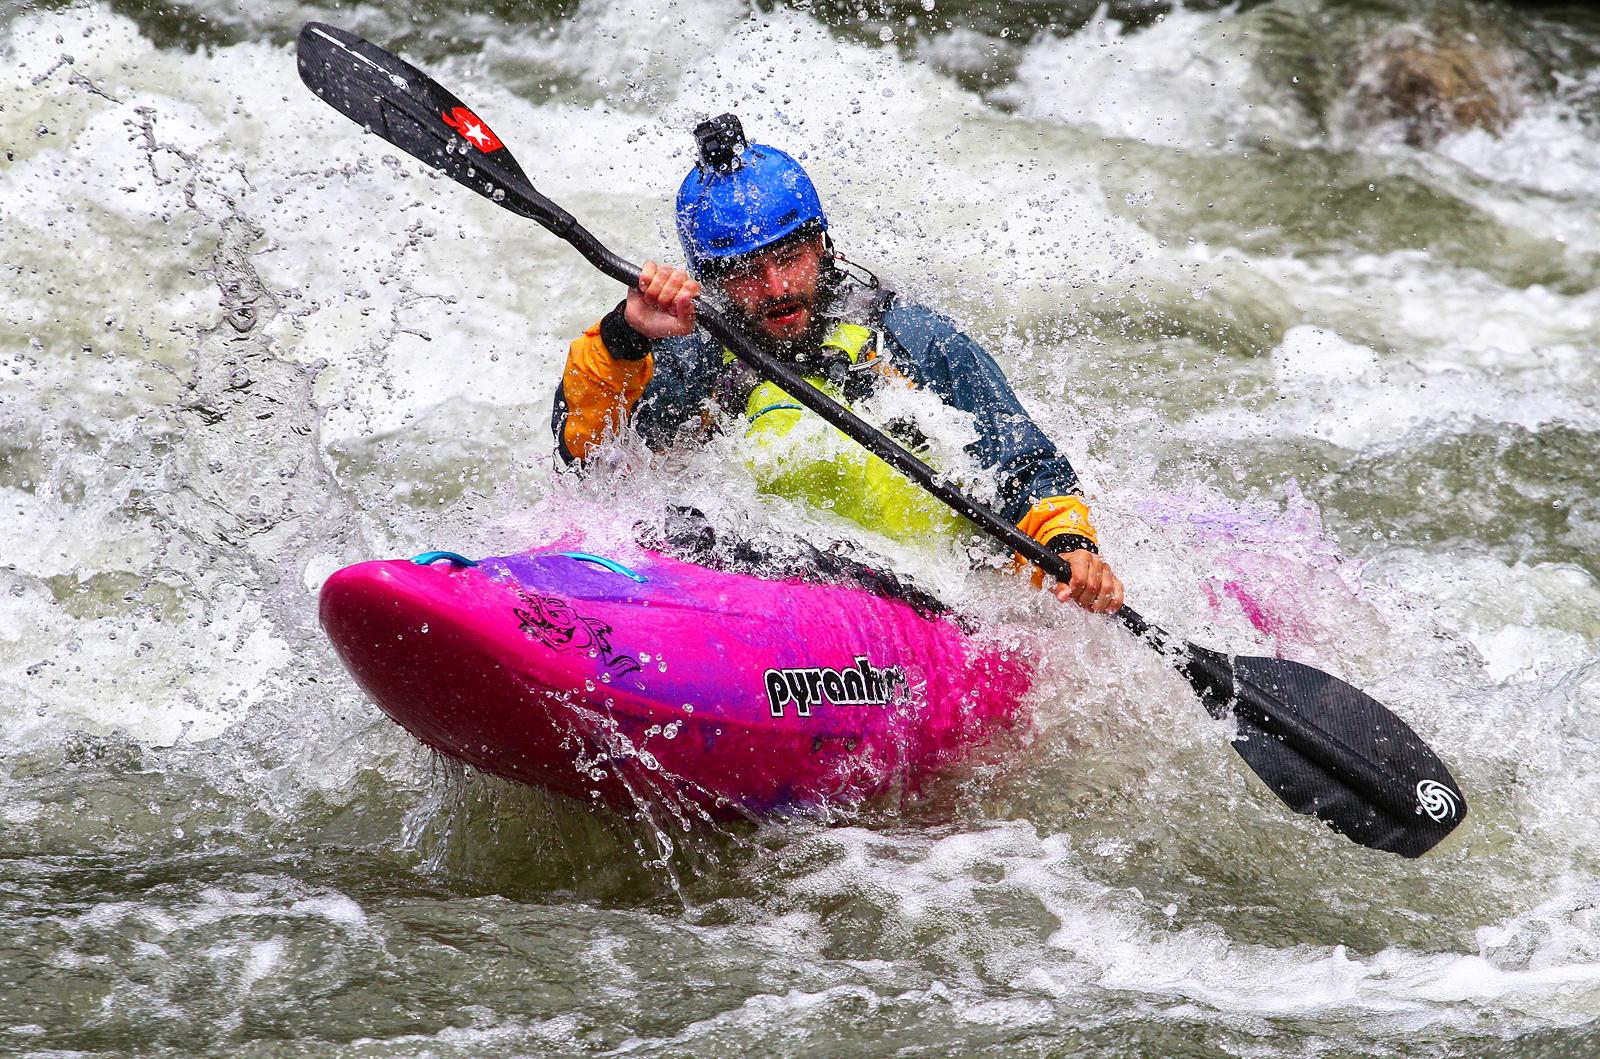 White Water Kayaking | Author Vladimir Gergov - Vladimir666 | PHOTO FORUM